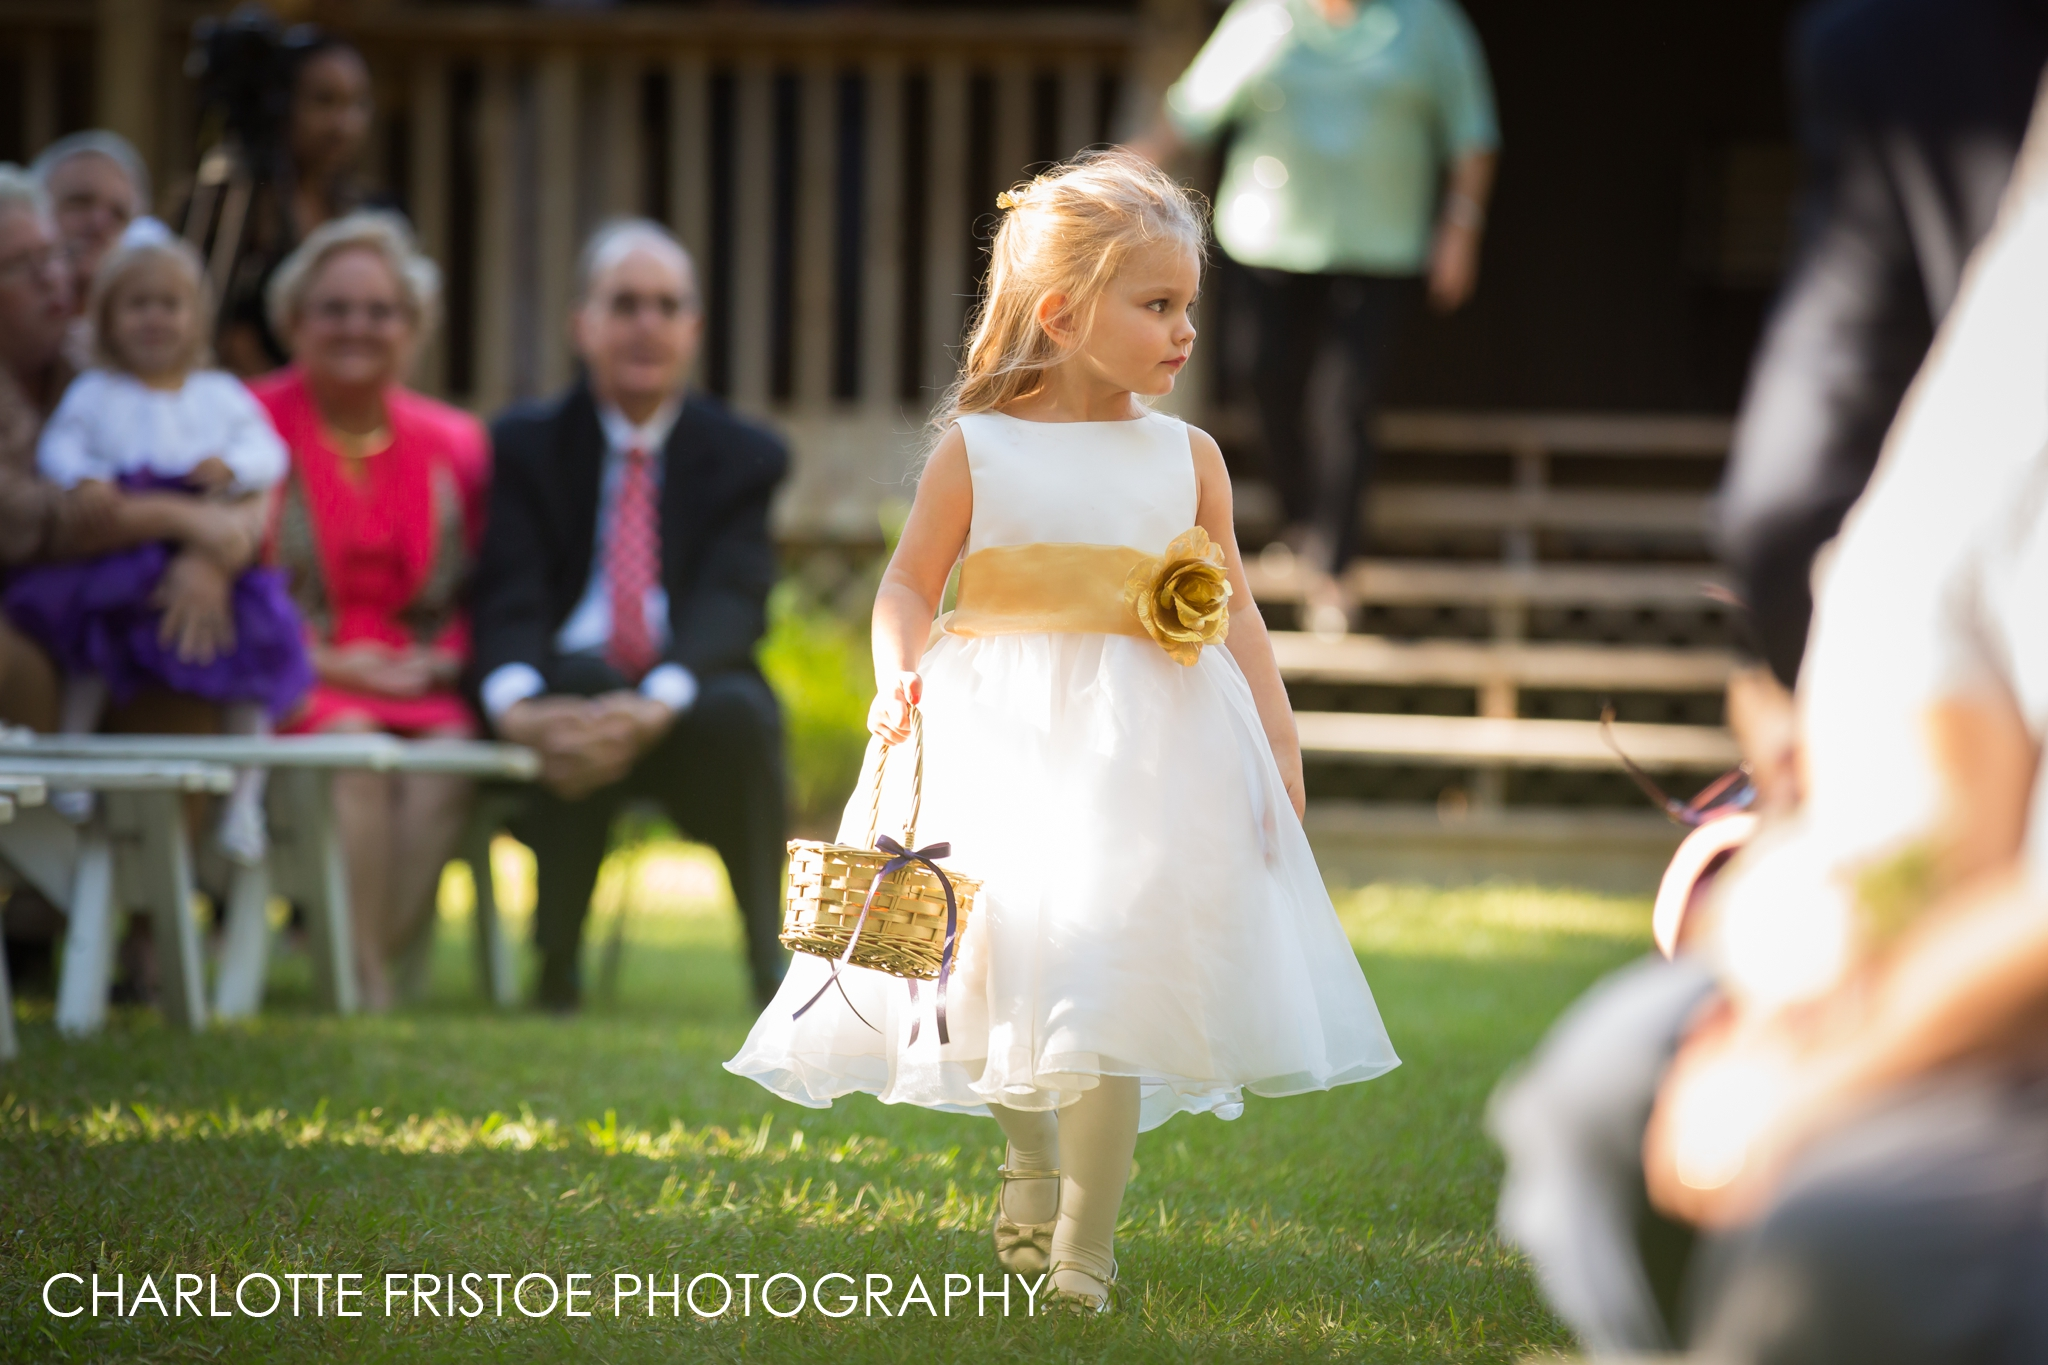 Lake Iamonia Wedding Charlotte Fristoe Photography-30.jpg